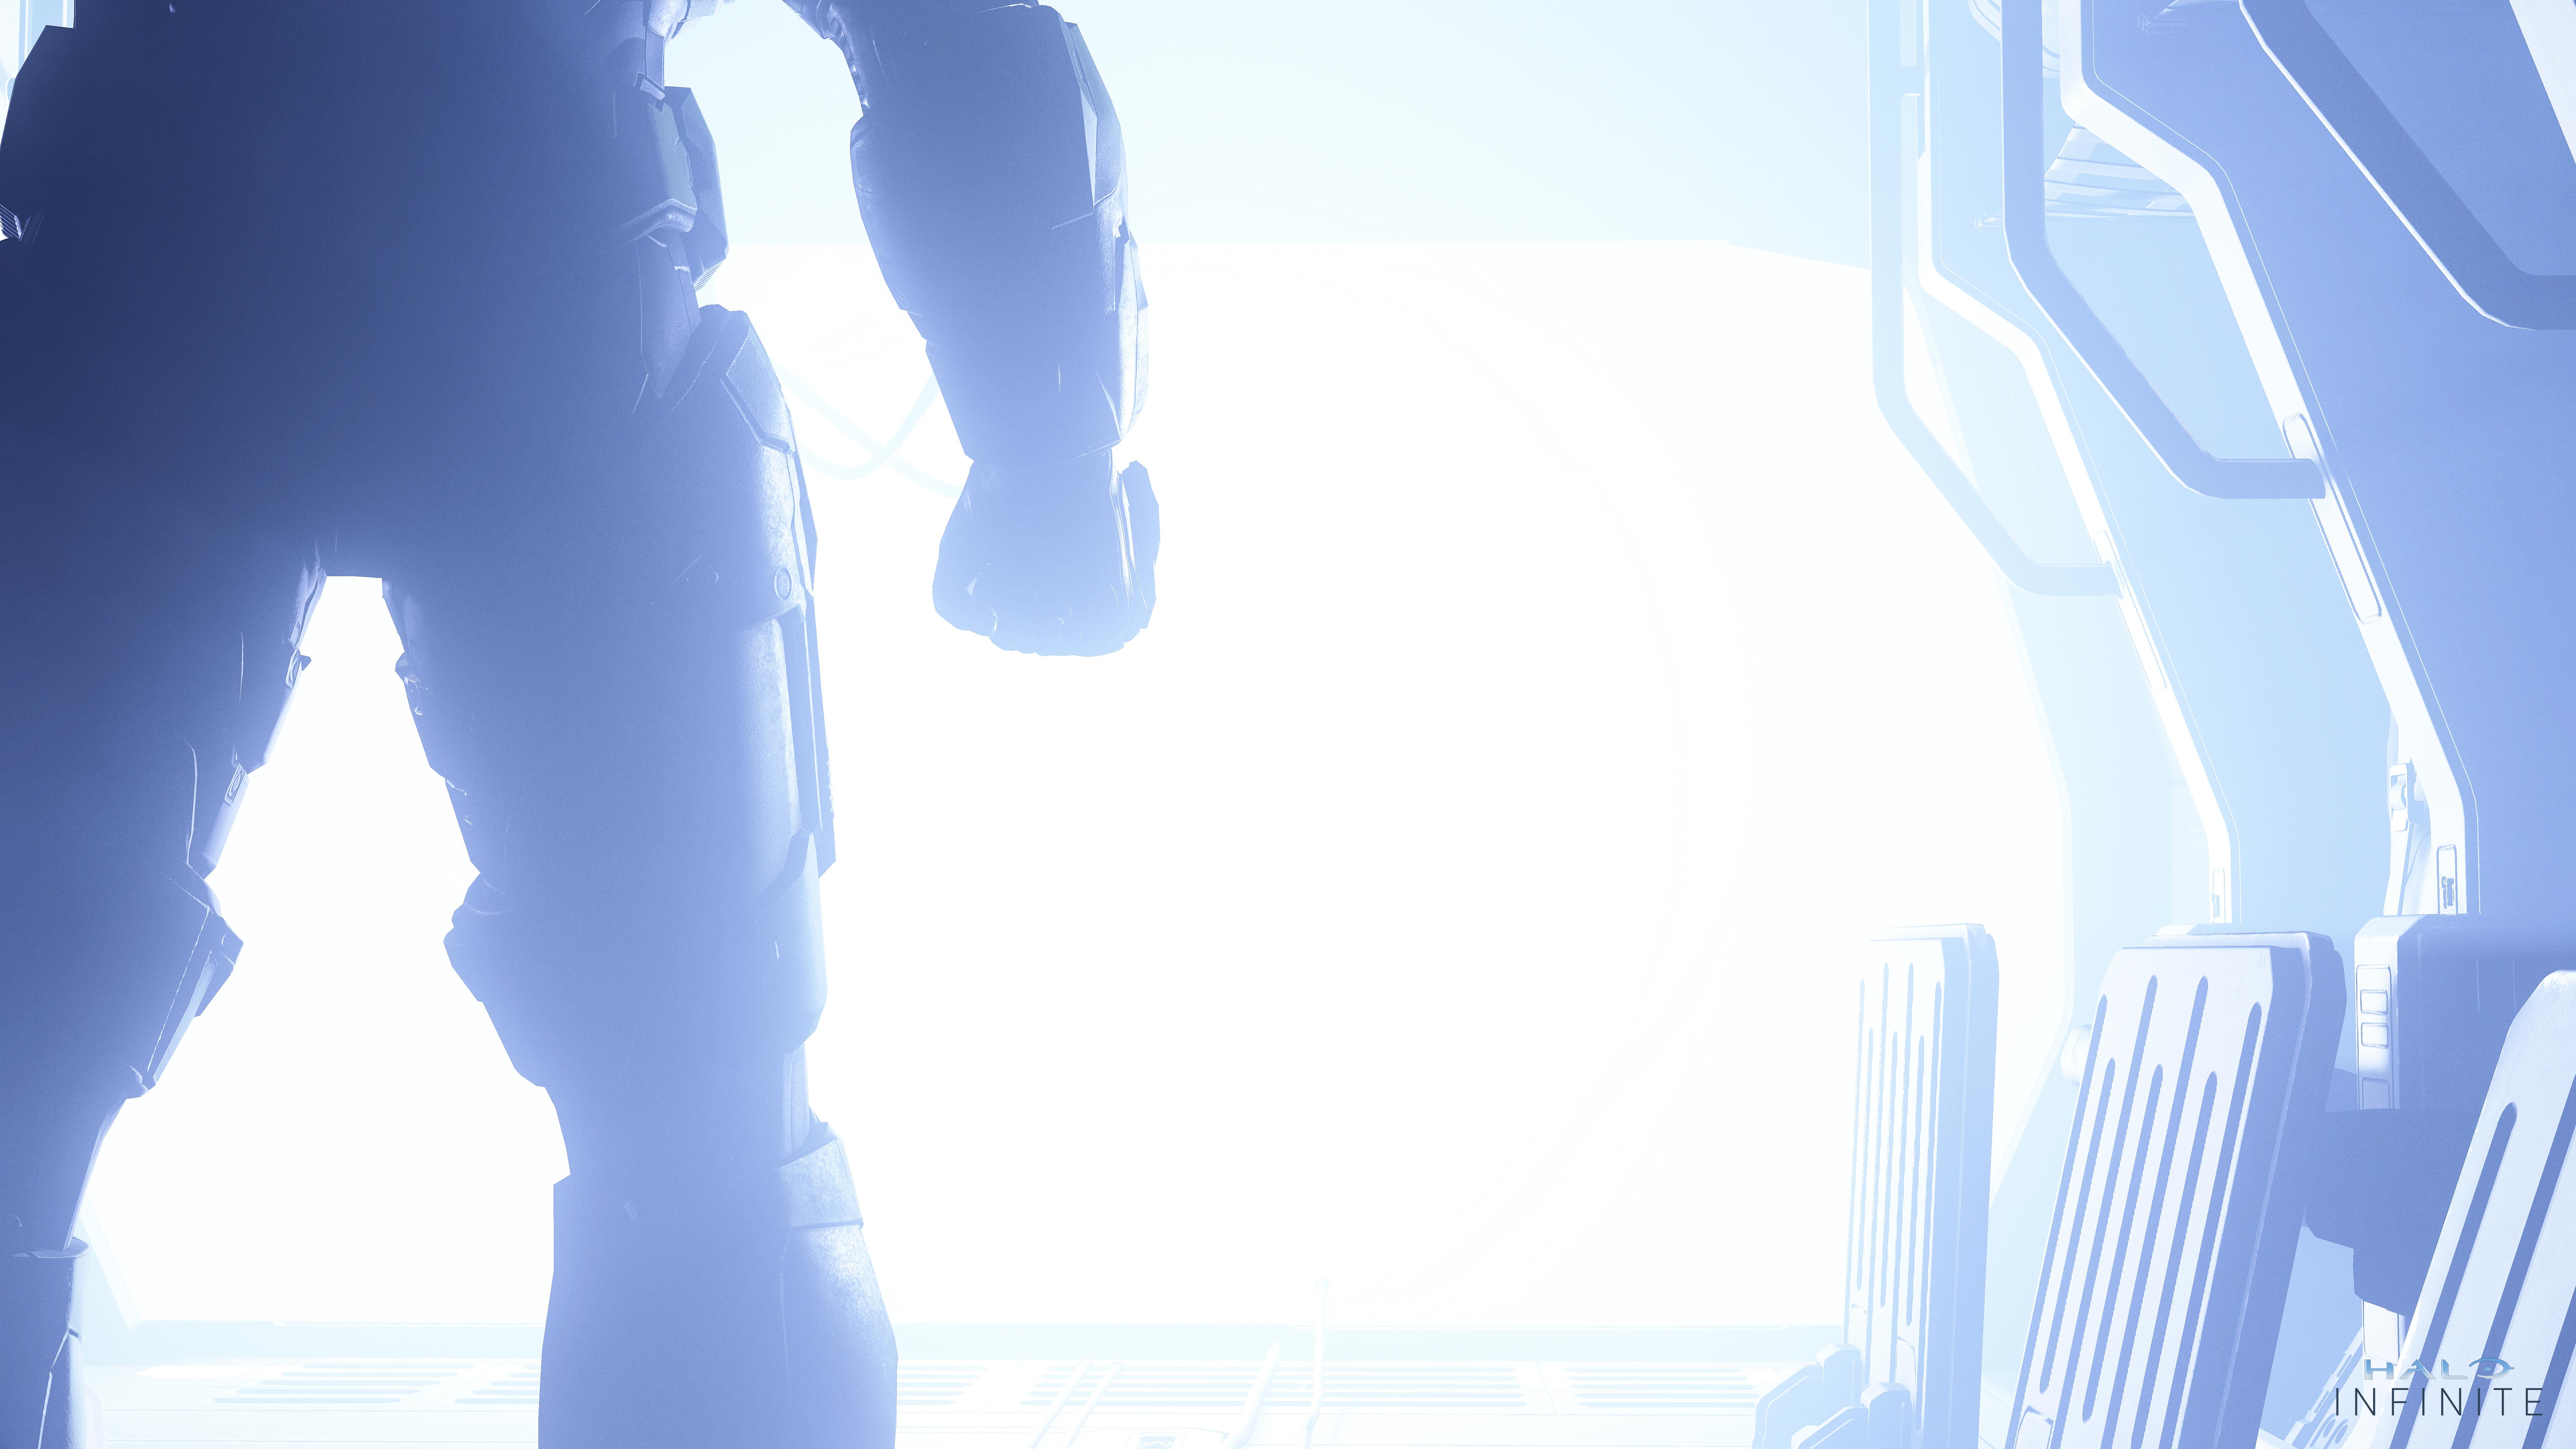 Геймплей - Halo Infinite 8K